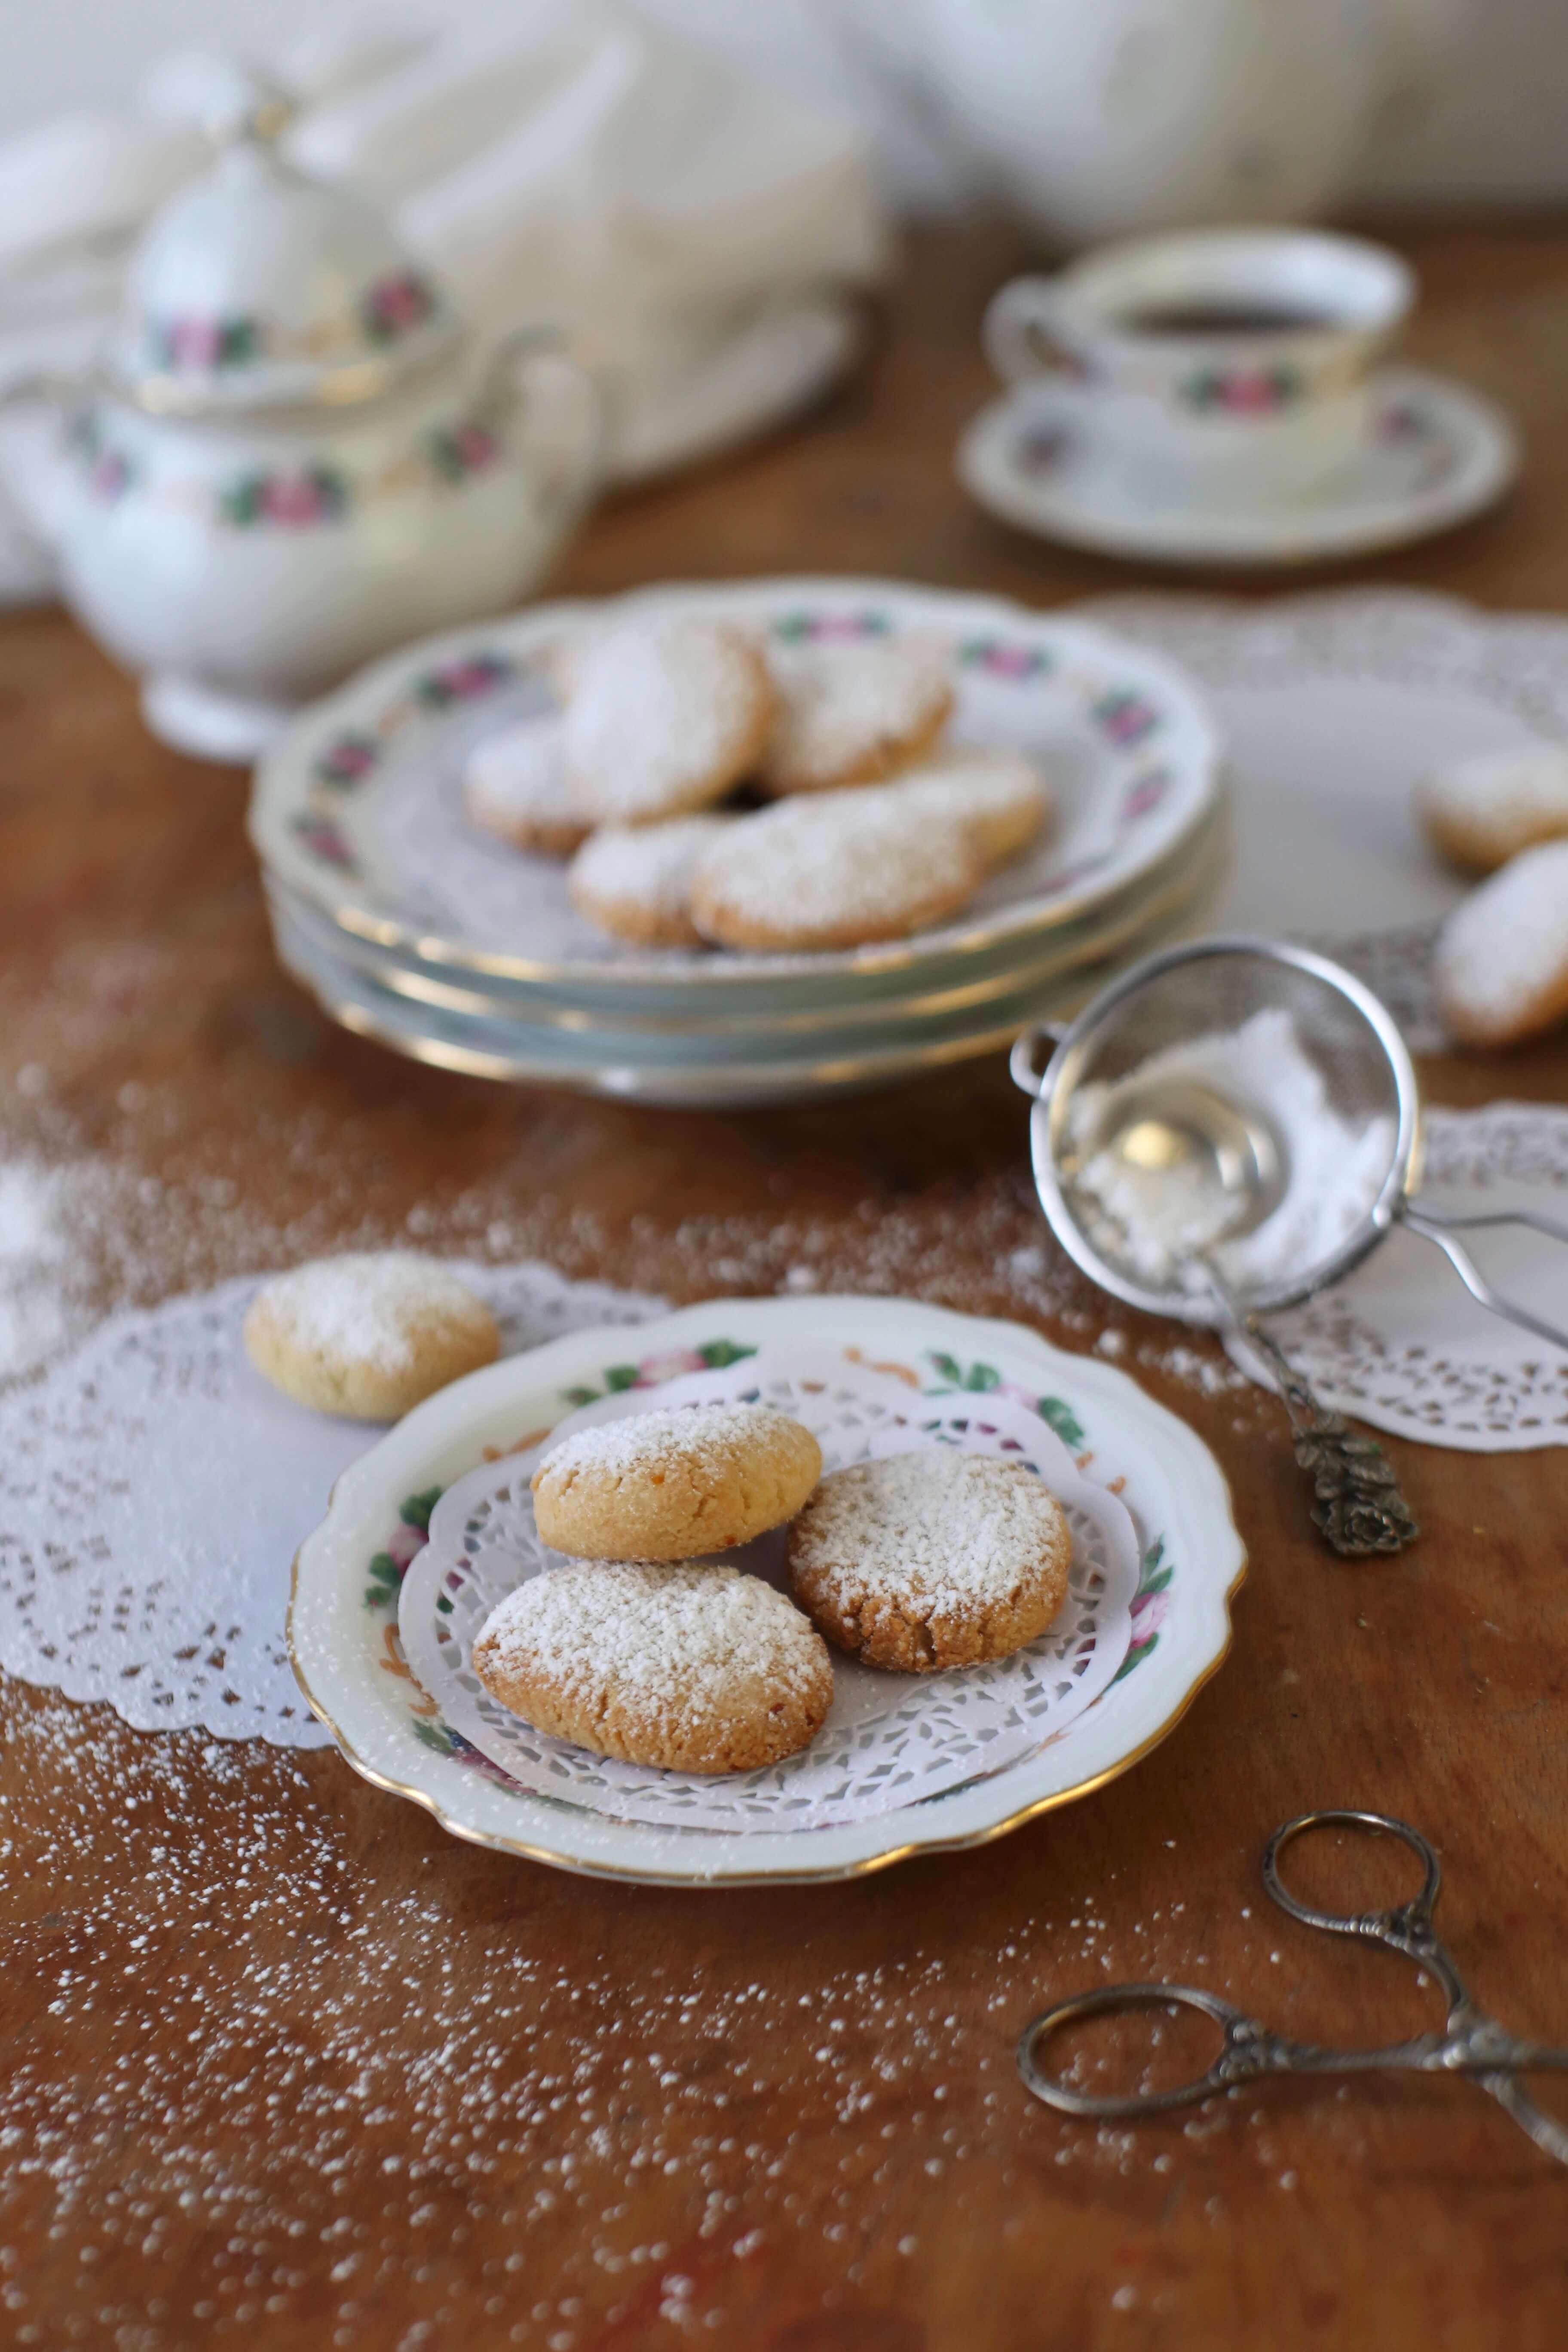 Ricciarelli di Siena | köstliche italienische Mandelkekse | Rezept